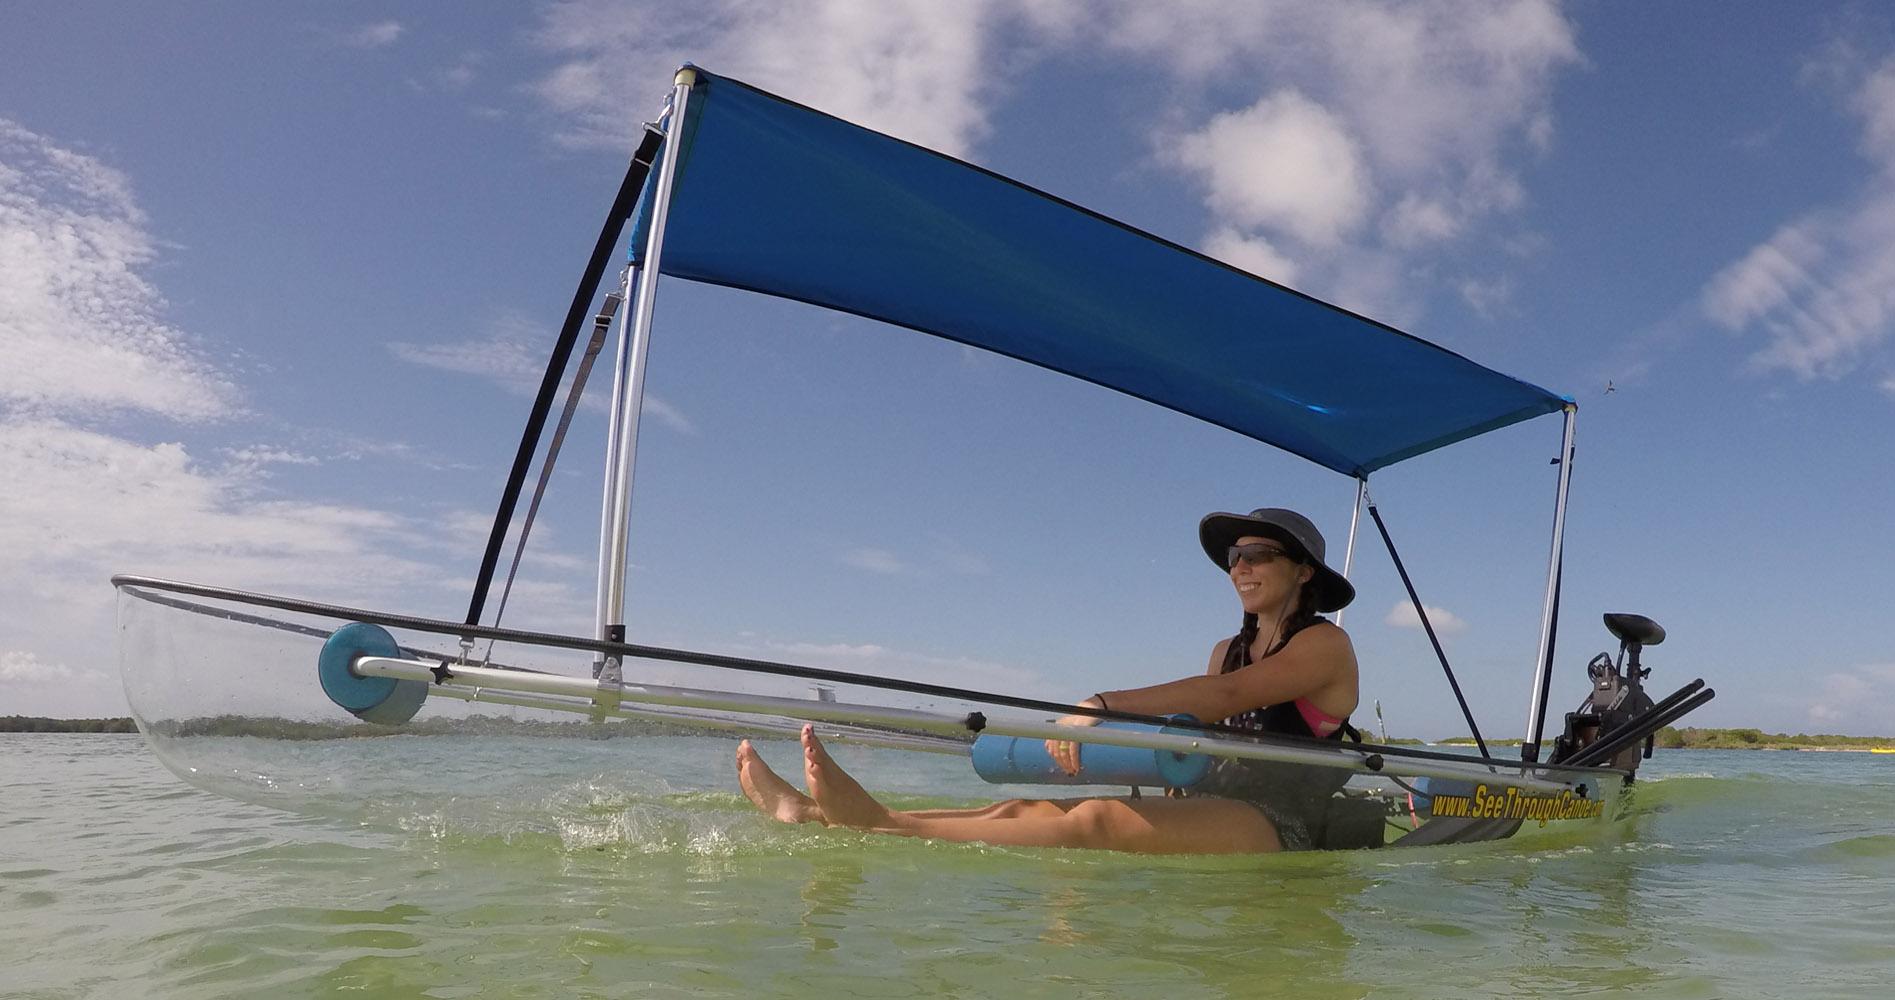 See Through Canoe Since Built Tough Not Cheap The